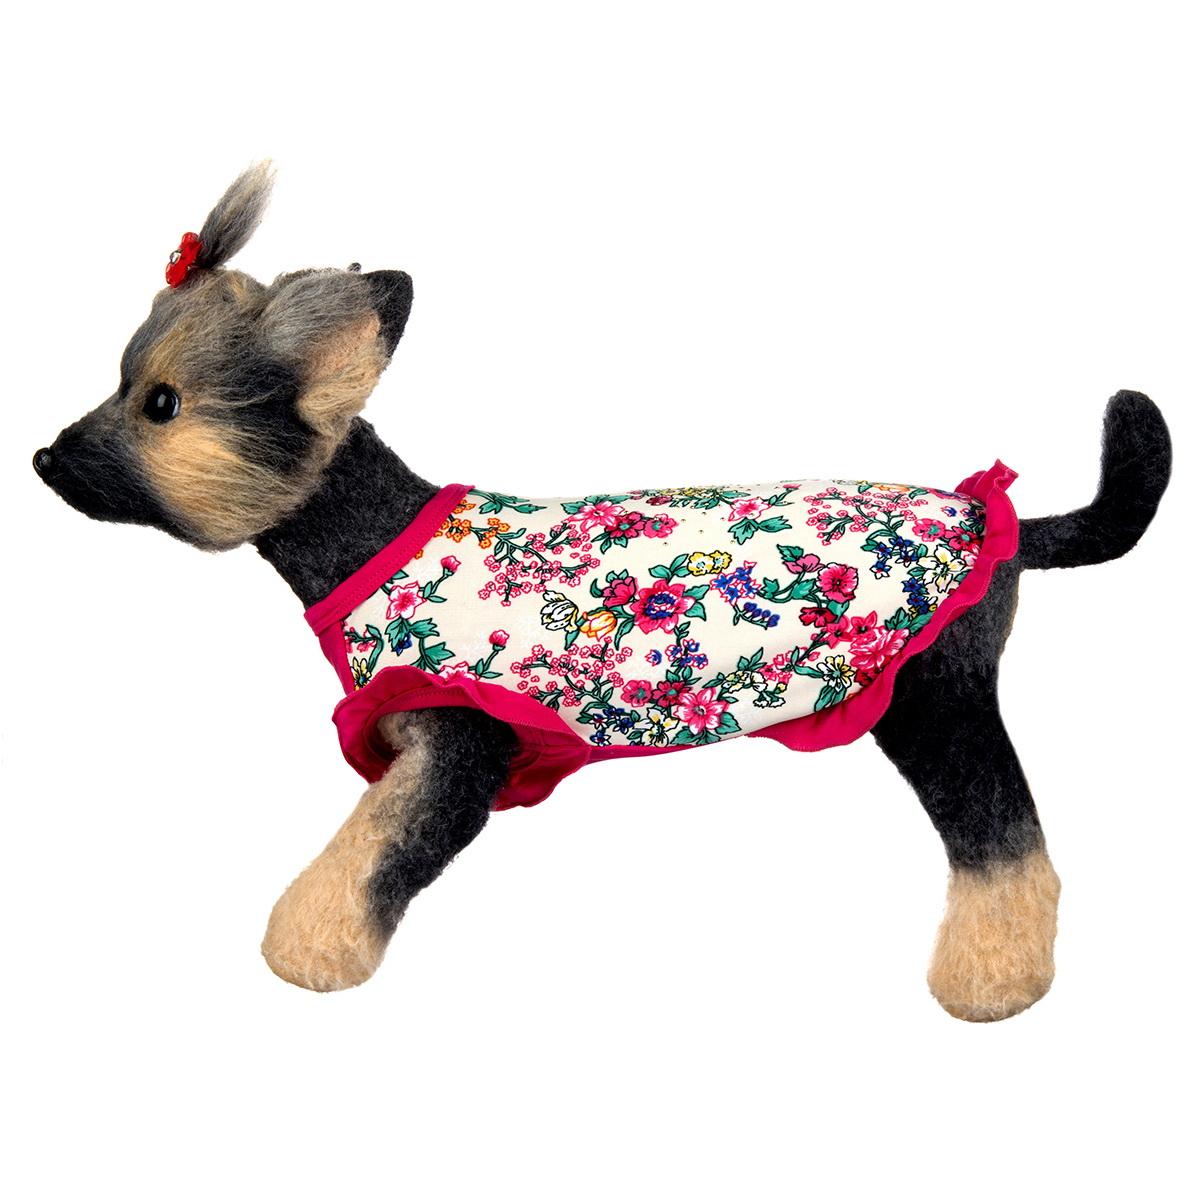 Майка для собак Dogmoda Оливия, для девочки. Размер 3 (L) догмода футболка с капюшоном для собак dogmoda 1